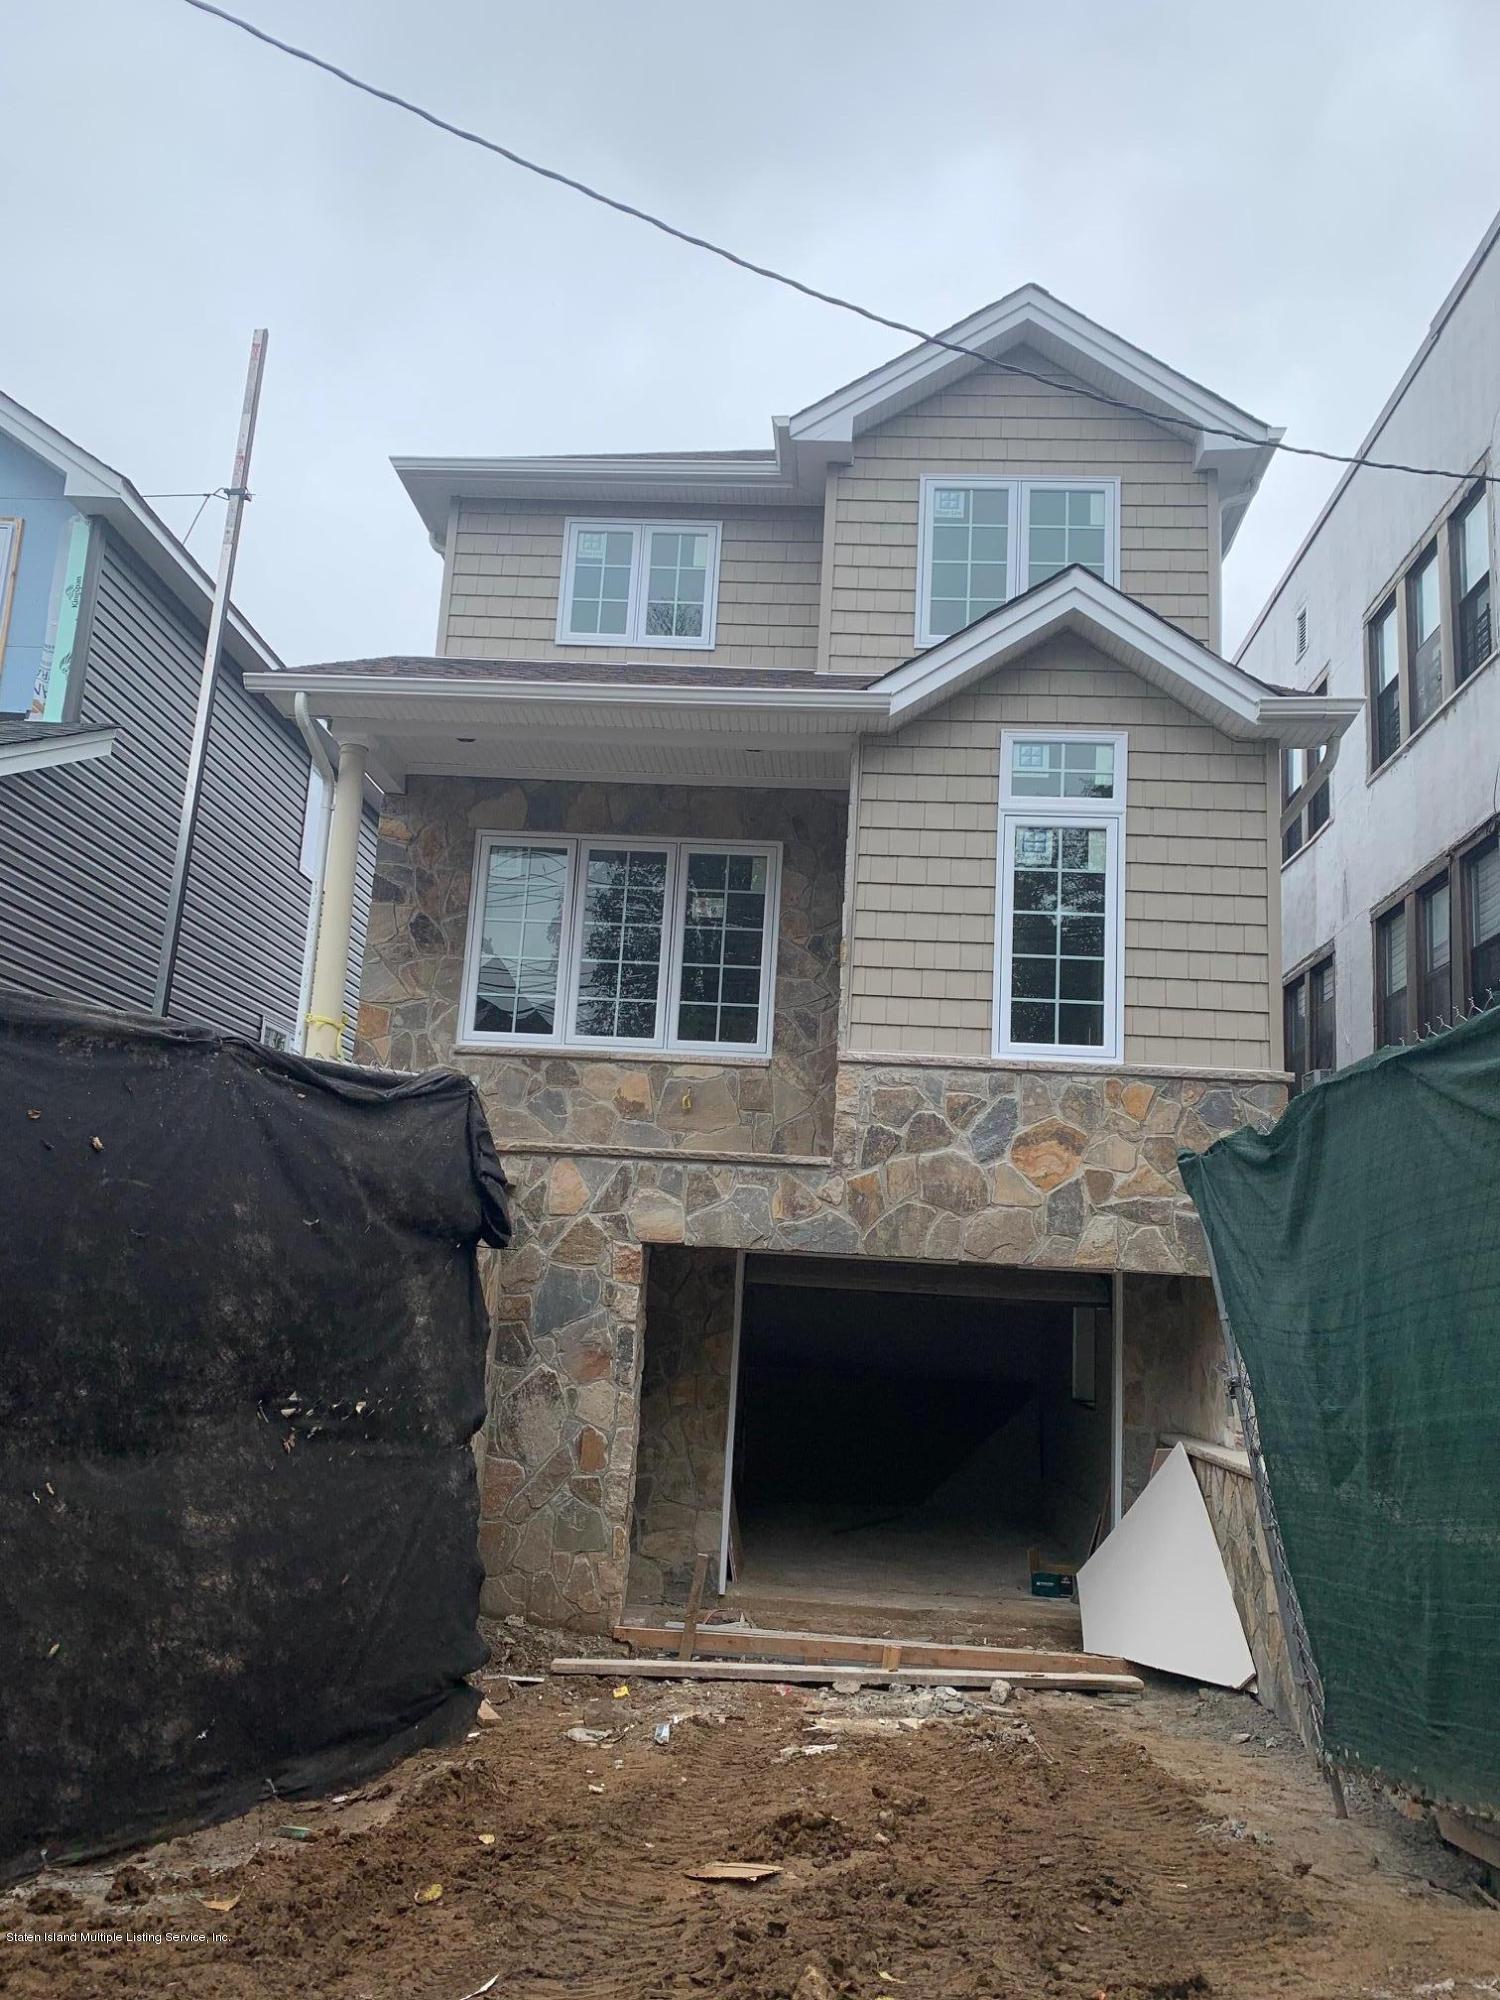 Single Family - Detached 32 Scribner Avenue  Staten Island, NY 10301, MLS-1128104-3